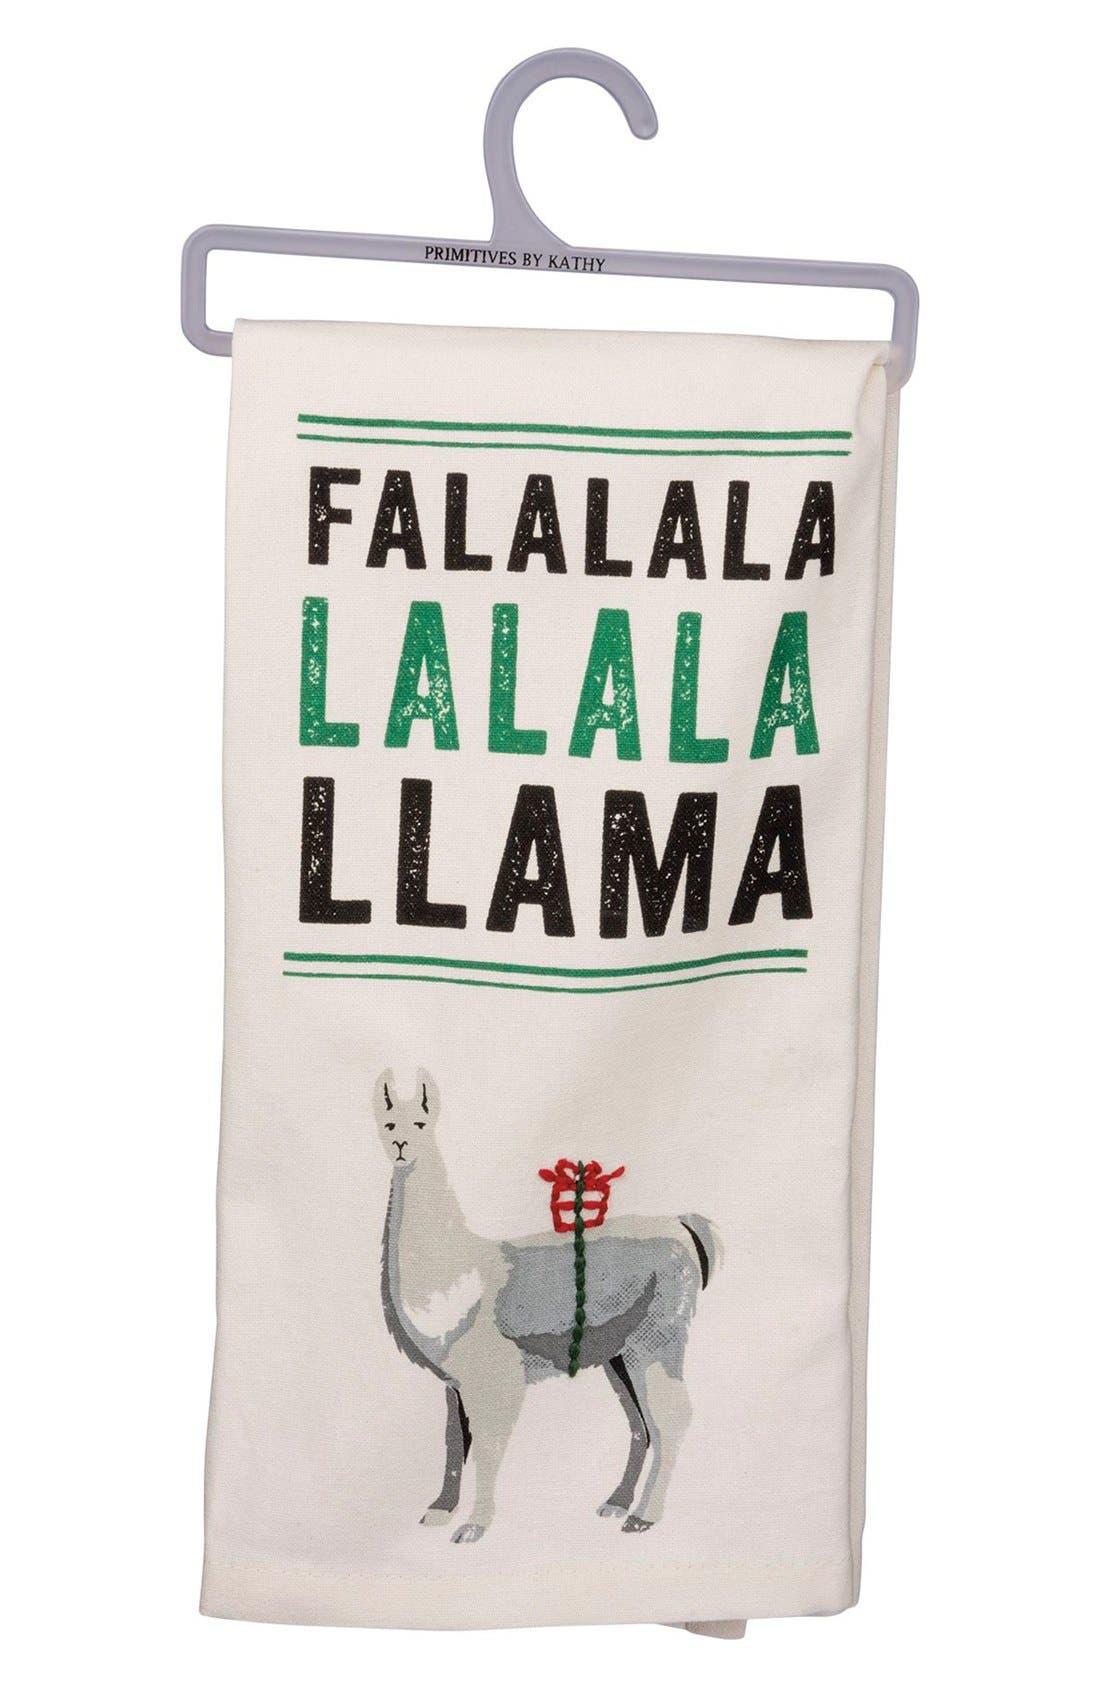 PRIMITIVES BY KATHY,                             Fa La La La Llama Dish Towel,                             Main thumbnail 1, color,                             100